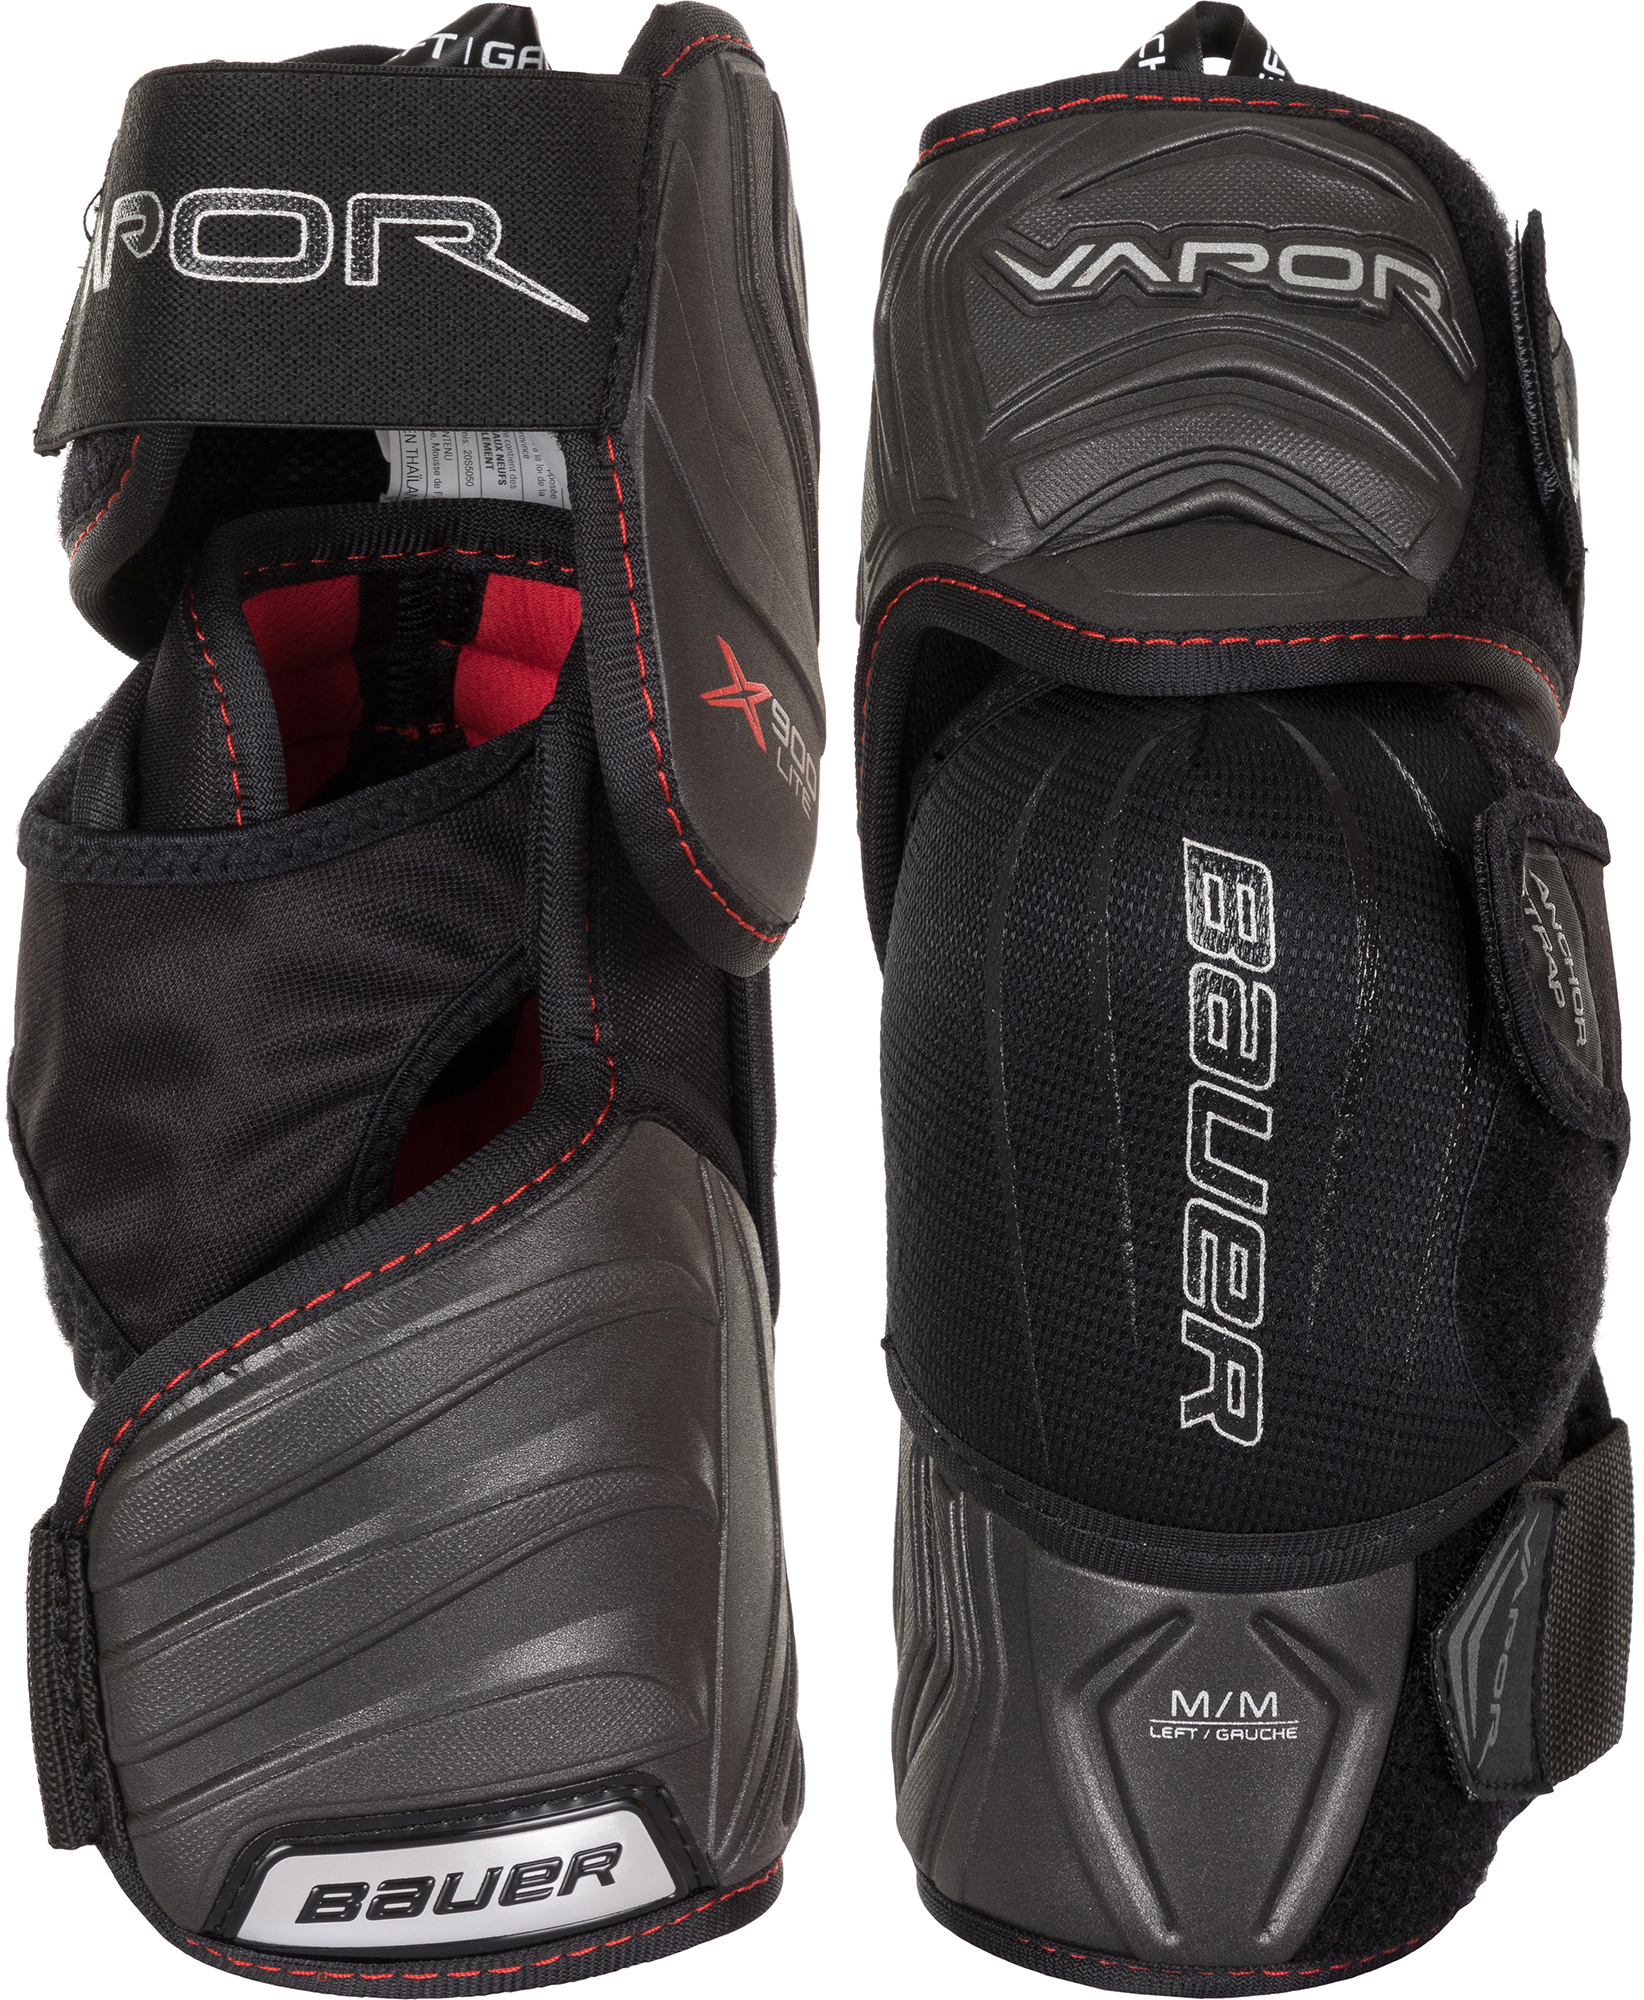 Bauer Налокотники хоккейные Bauer VAPOR X900 LITE защита bauer шорты bauer x900 взрослые